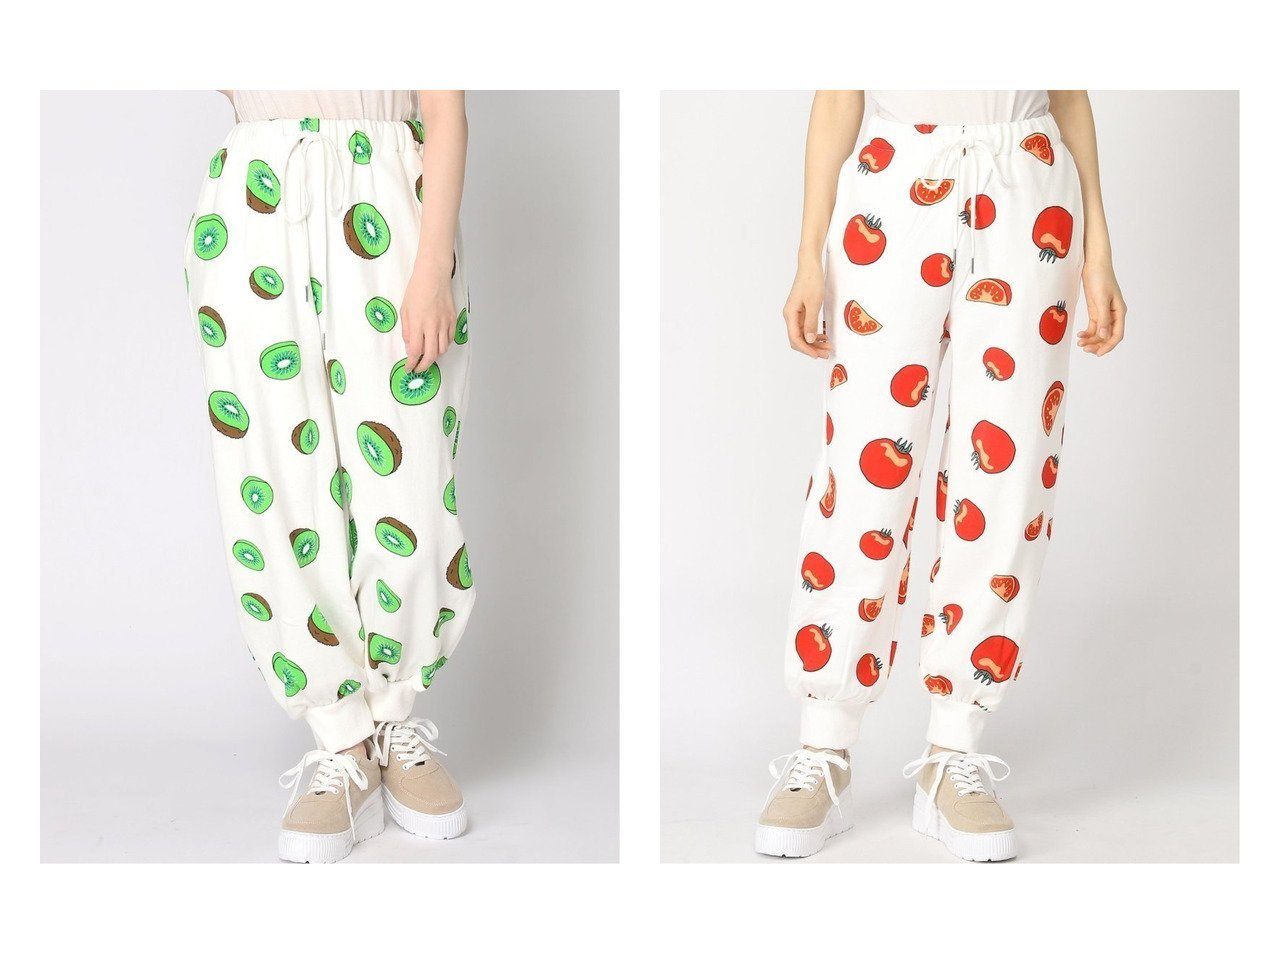 【PUNYUS/プニュズ】のフード総柄スウェットパンツ パンツのおすすめ!人気、トレンド・レディースファッションの通販 おすすめで人気の流行・トレンド、ファッションの通販商品 メンズファッション・キッズファッション・インテリア・家具・レディースファッション・服の通販 founy(ファニー) https://founy.com/ ファッション Fashion レディースファッション WOMEN パンツ Pants ジーンズ スニーカー リラックス |ID:crp329100000022444